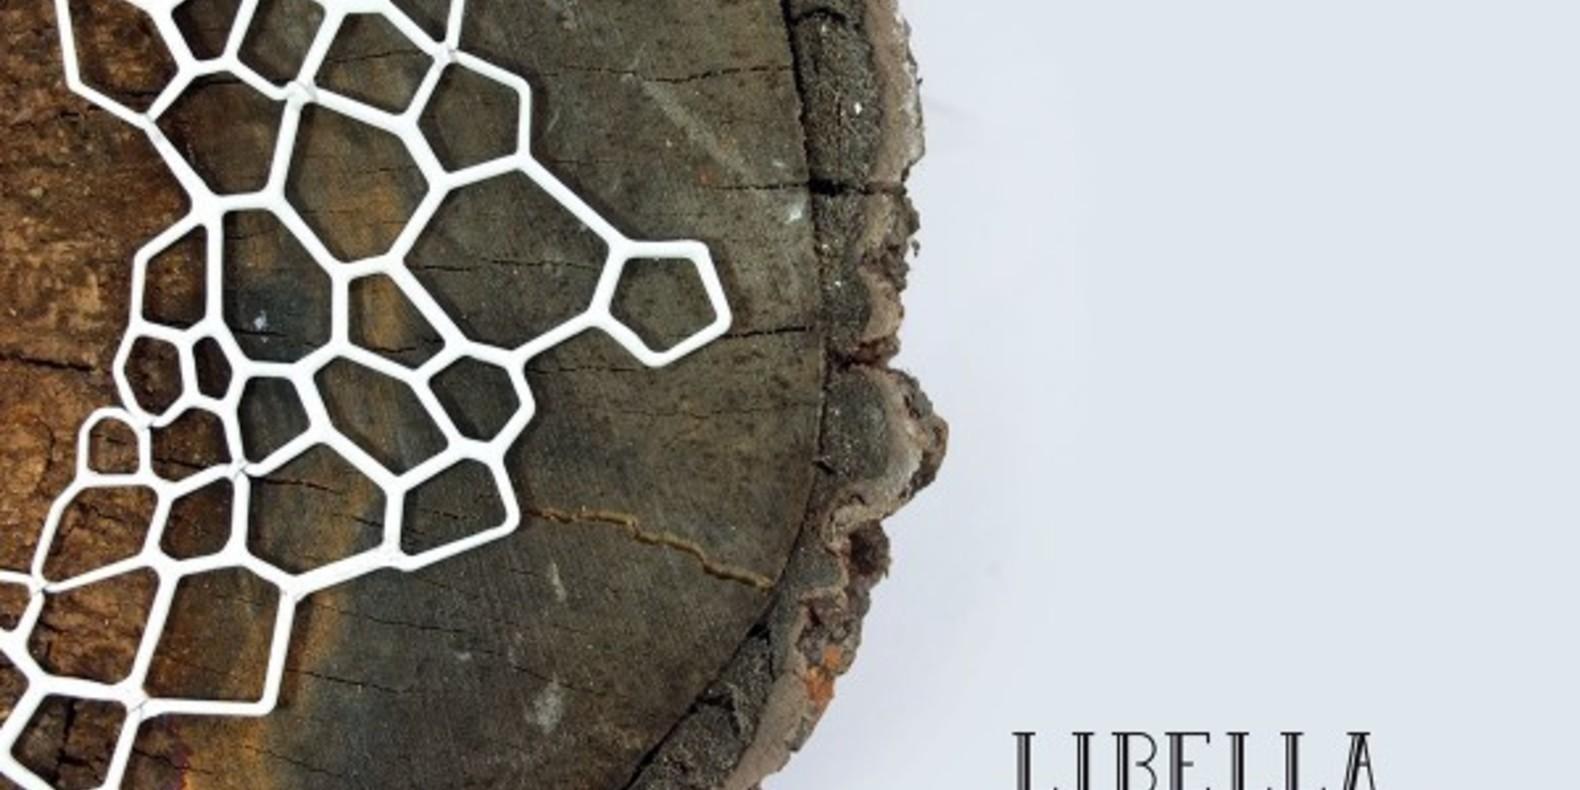 Libella necklace collier imprimé en 3D fichier STL cults 3D printed libellule Cecilia Palomino 2